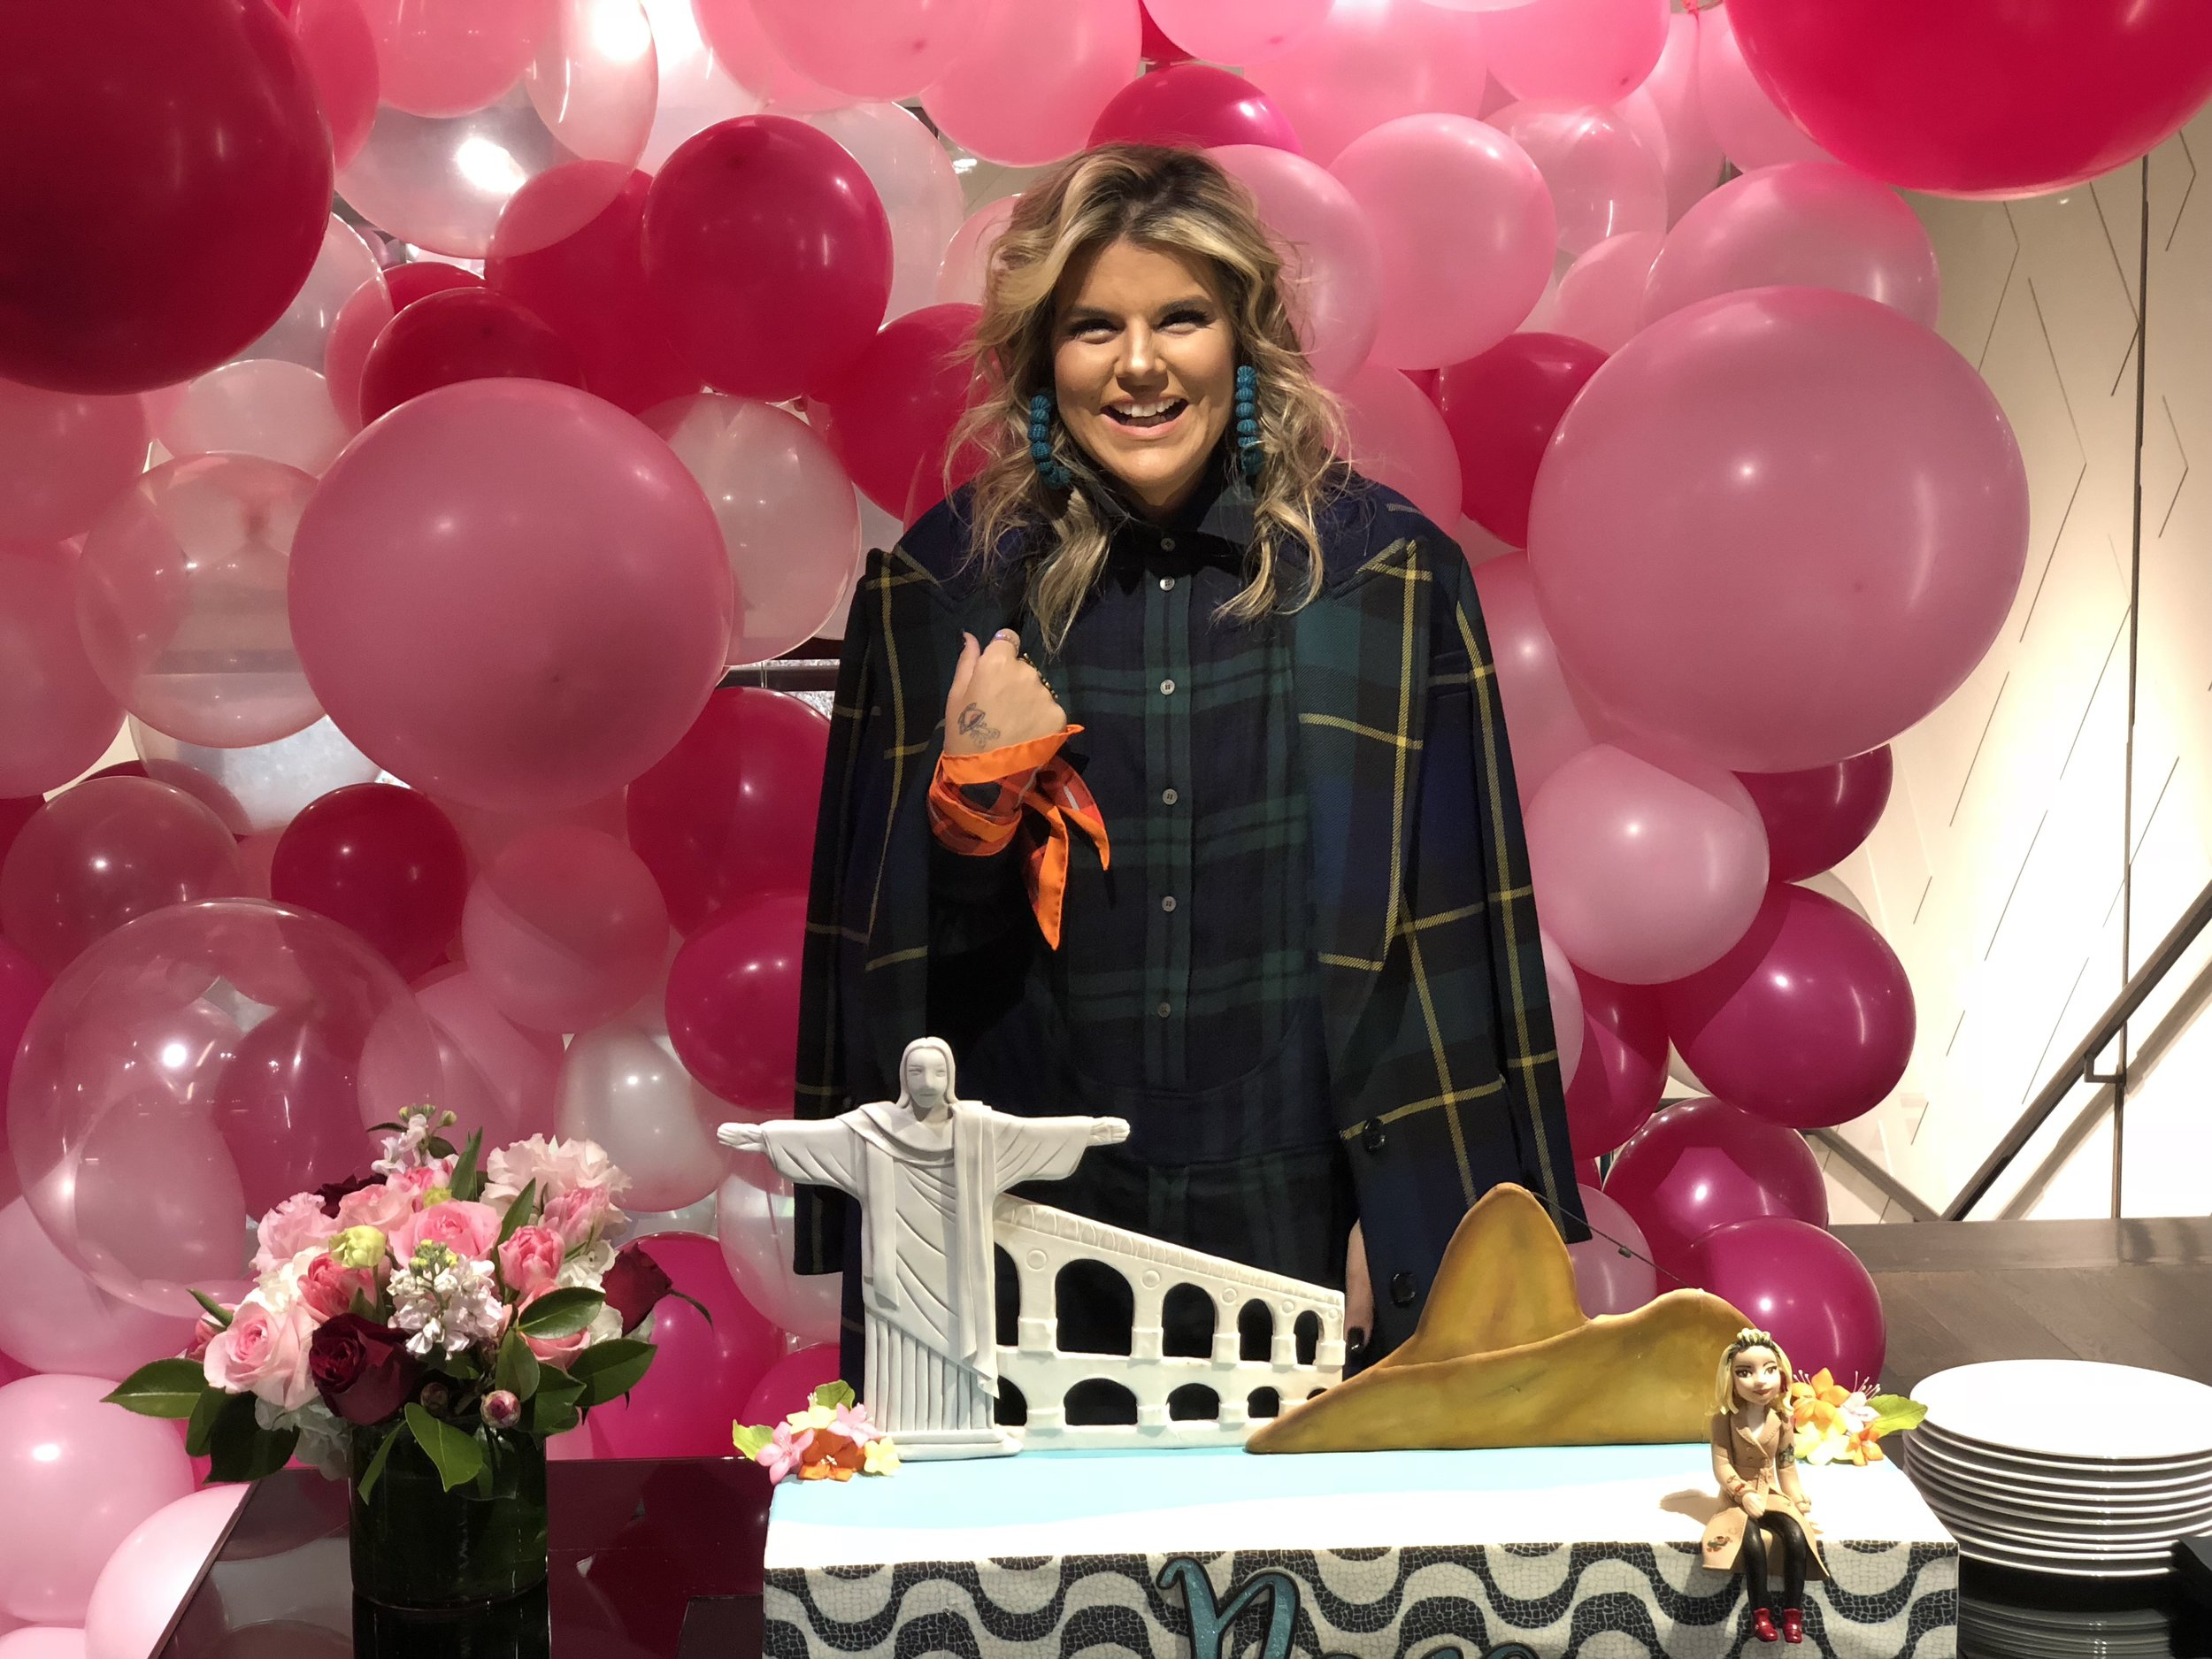 Nana Cunha Birthday Party - Burberry Flagship New York